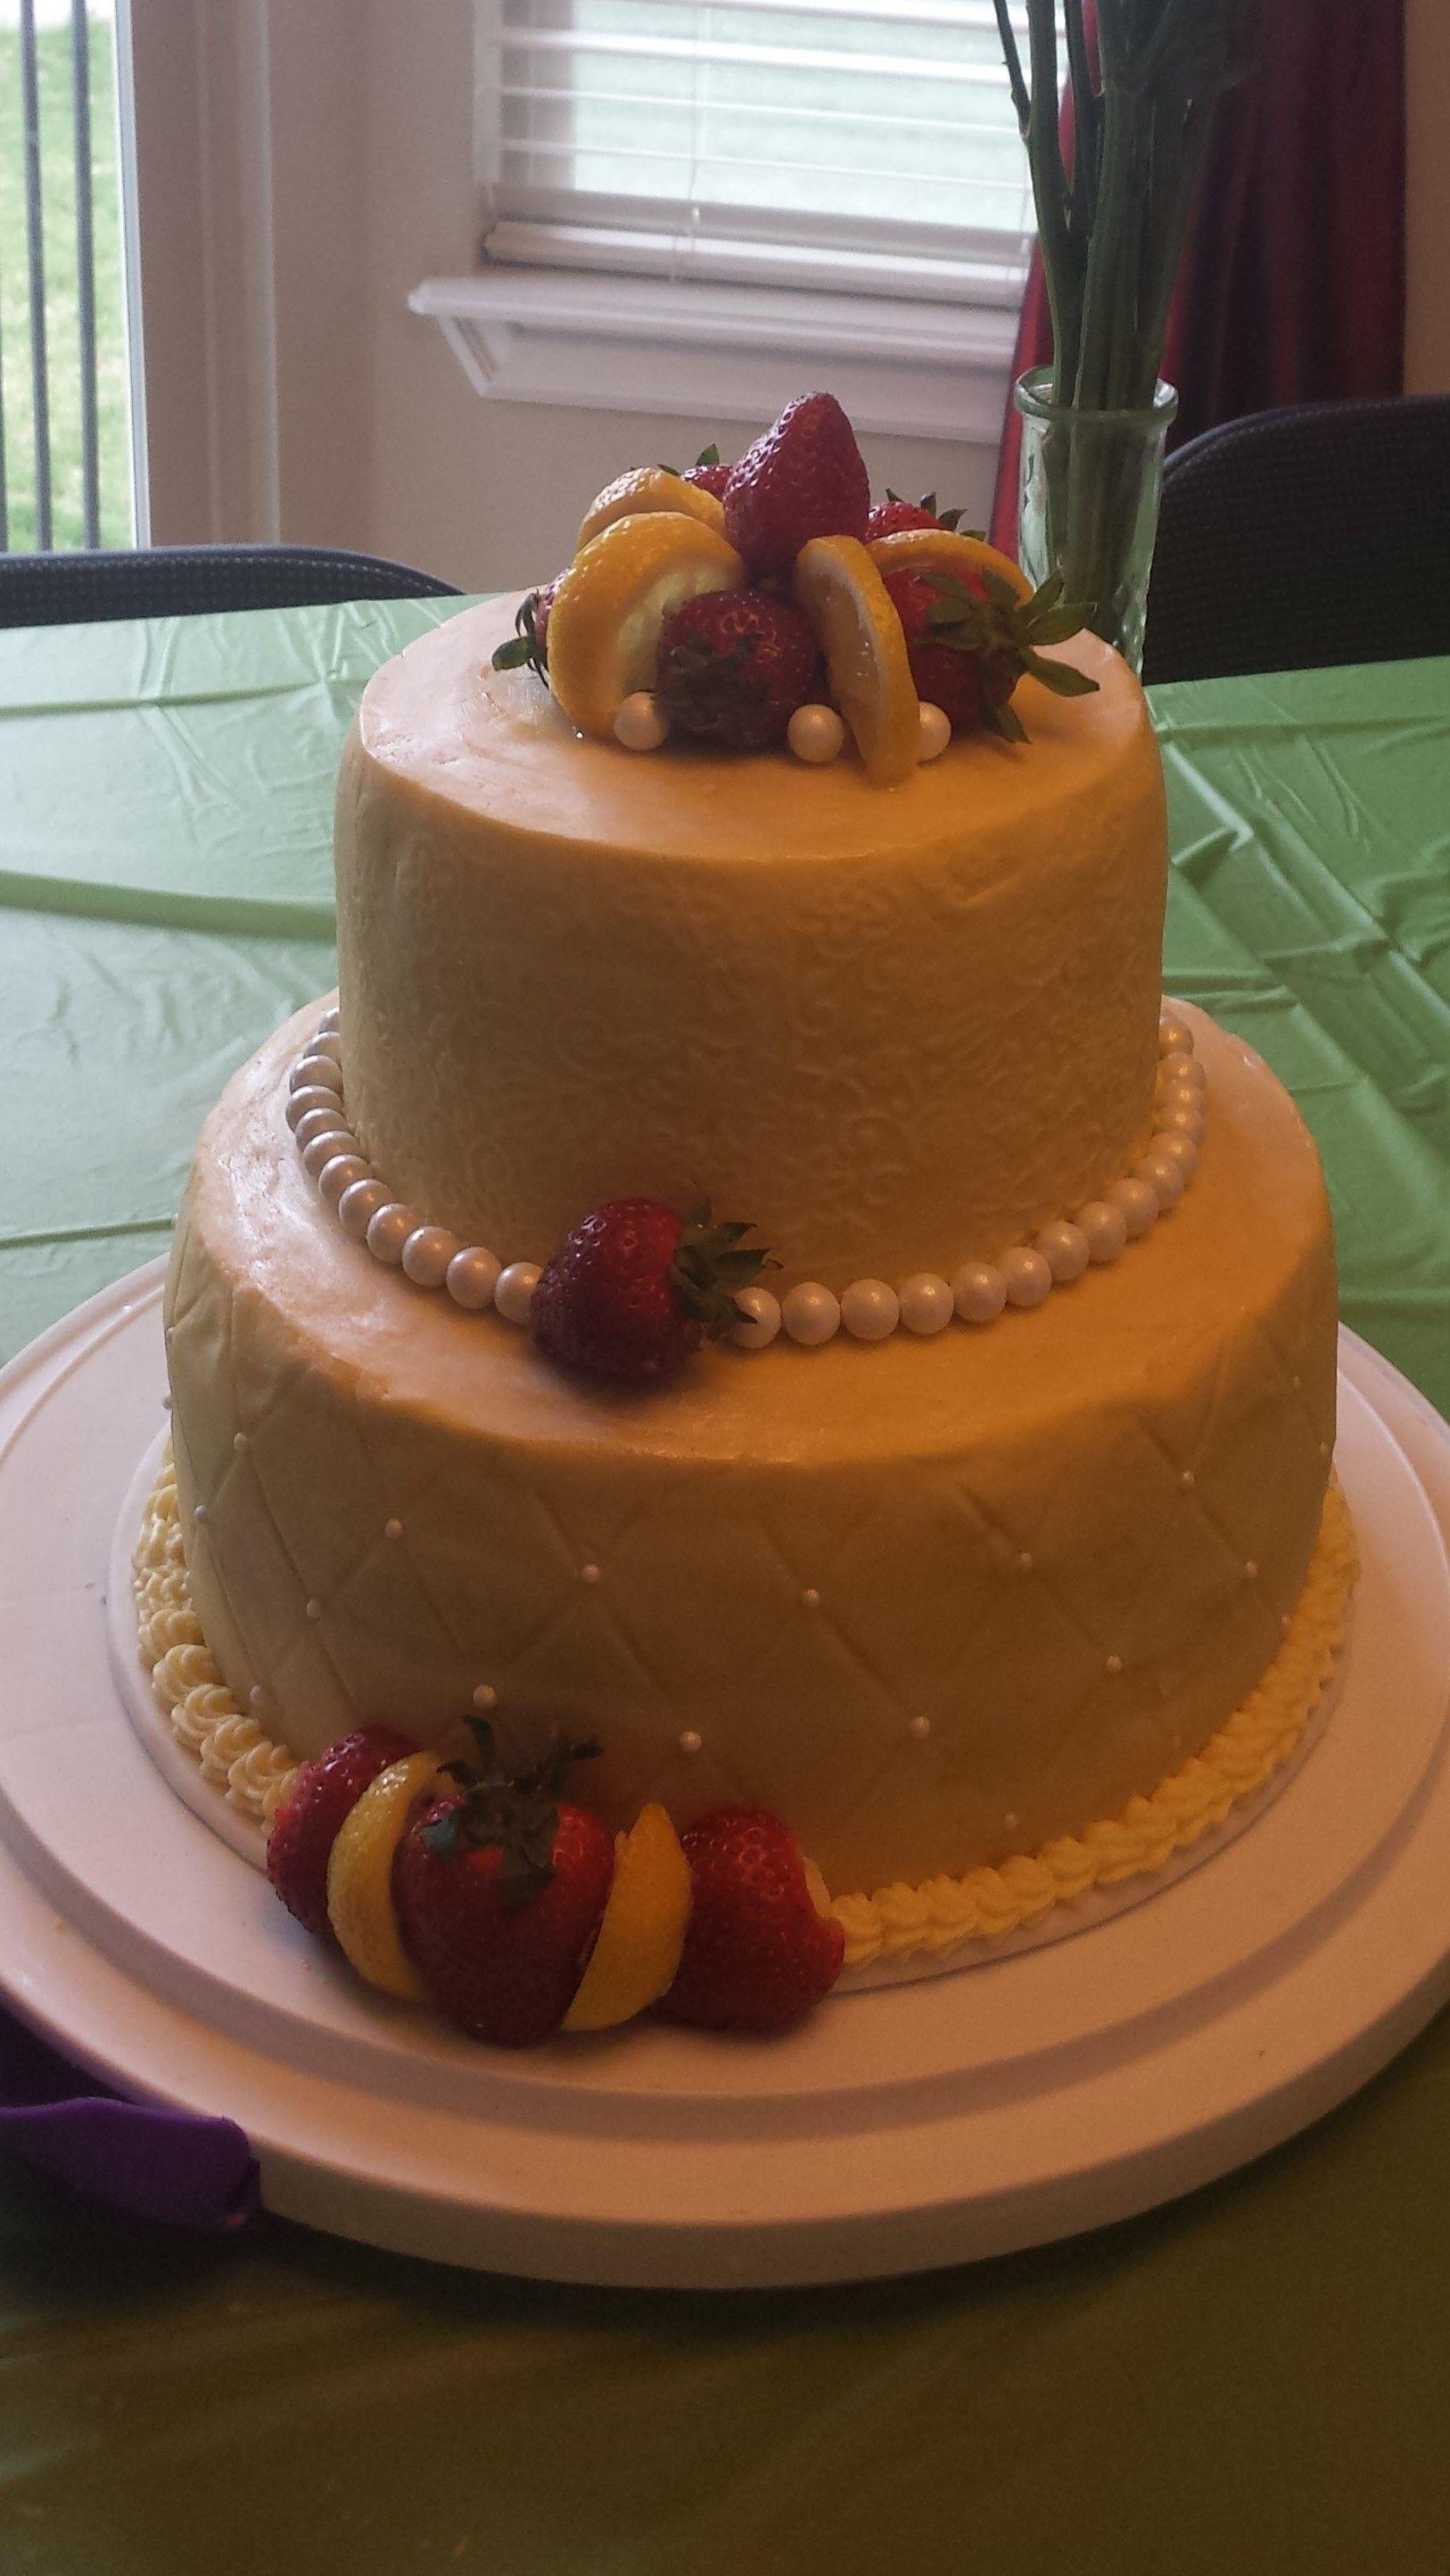 Strawberry lemonade cake with lemon fudge buttercream, lemon cake and strawberry filling